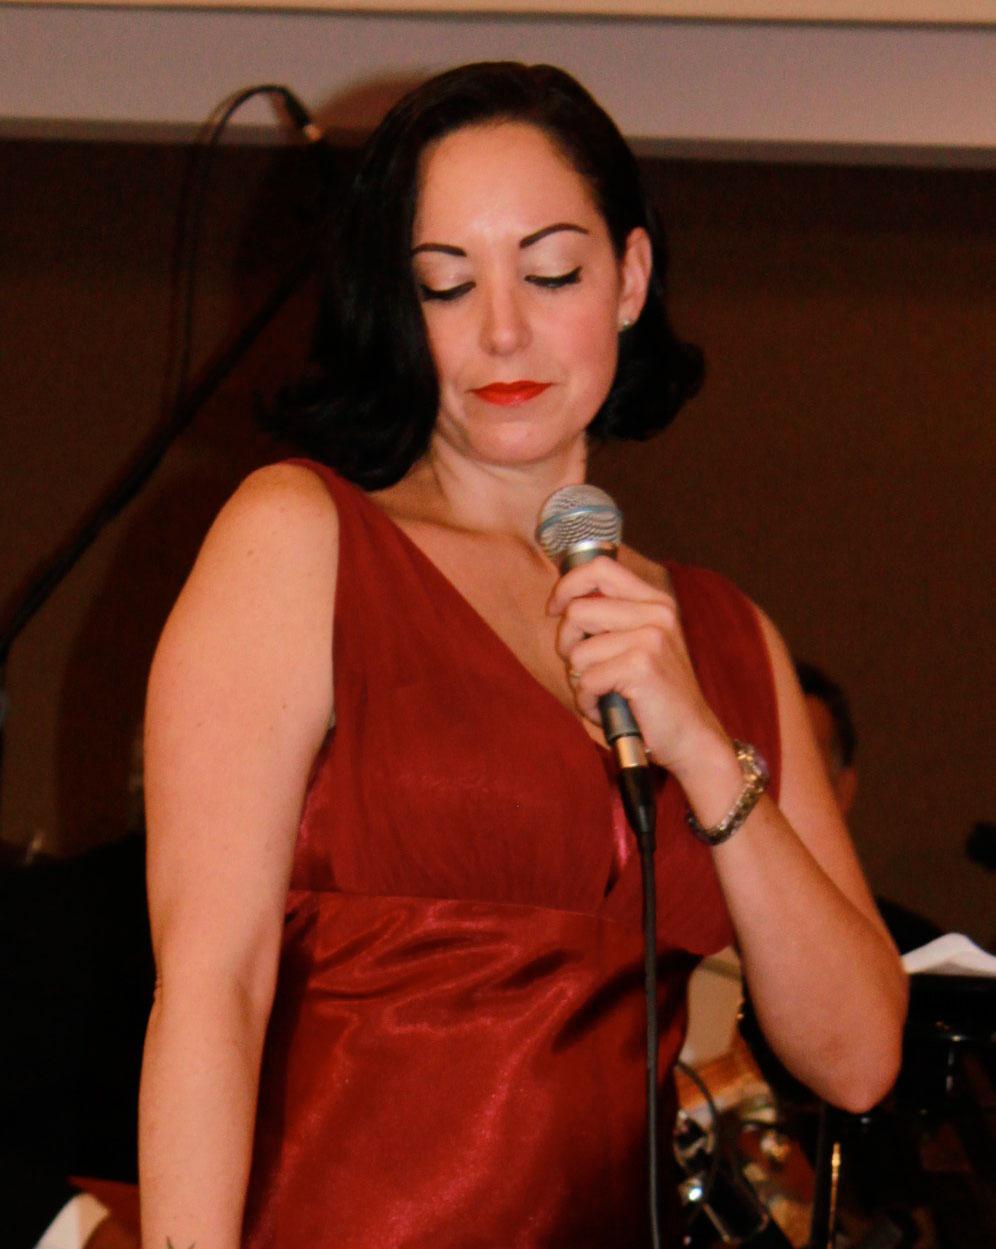 Singer Danielle Natividad